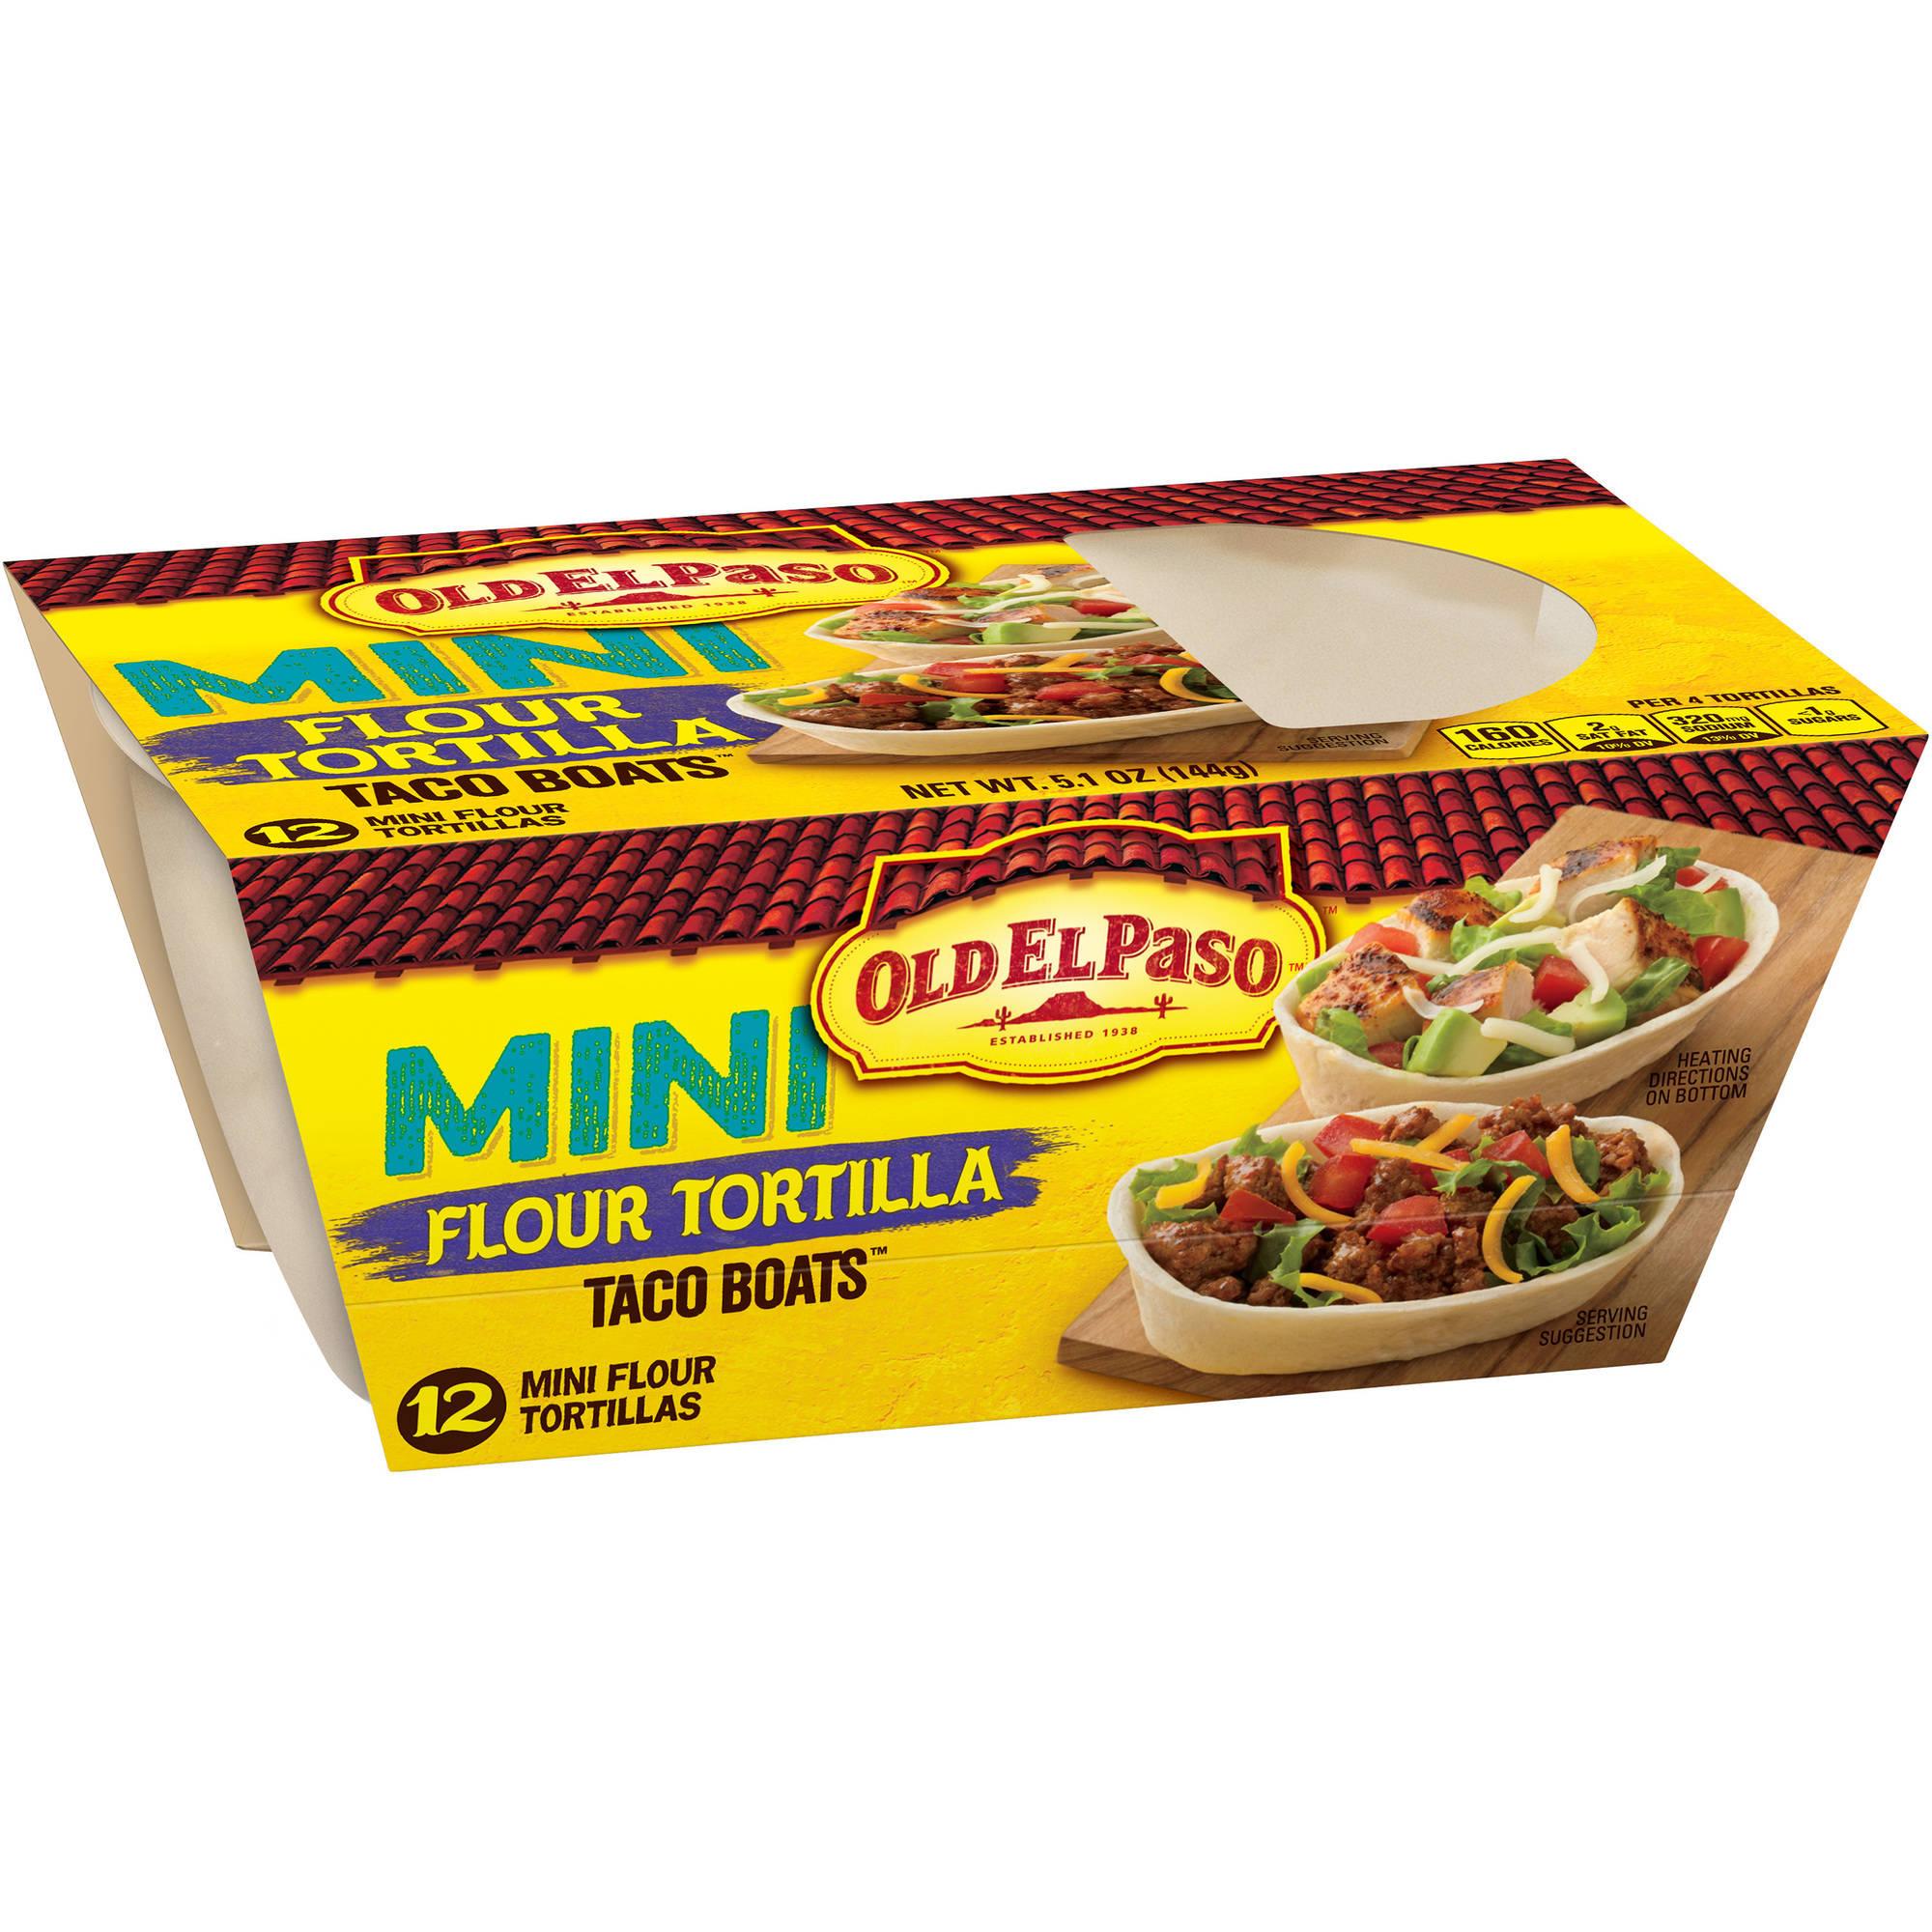 Old El Paso® Mini Soft Stand 'n Stuff™ Flour Tortilla Taco Boats 12 ct Pack